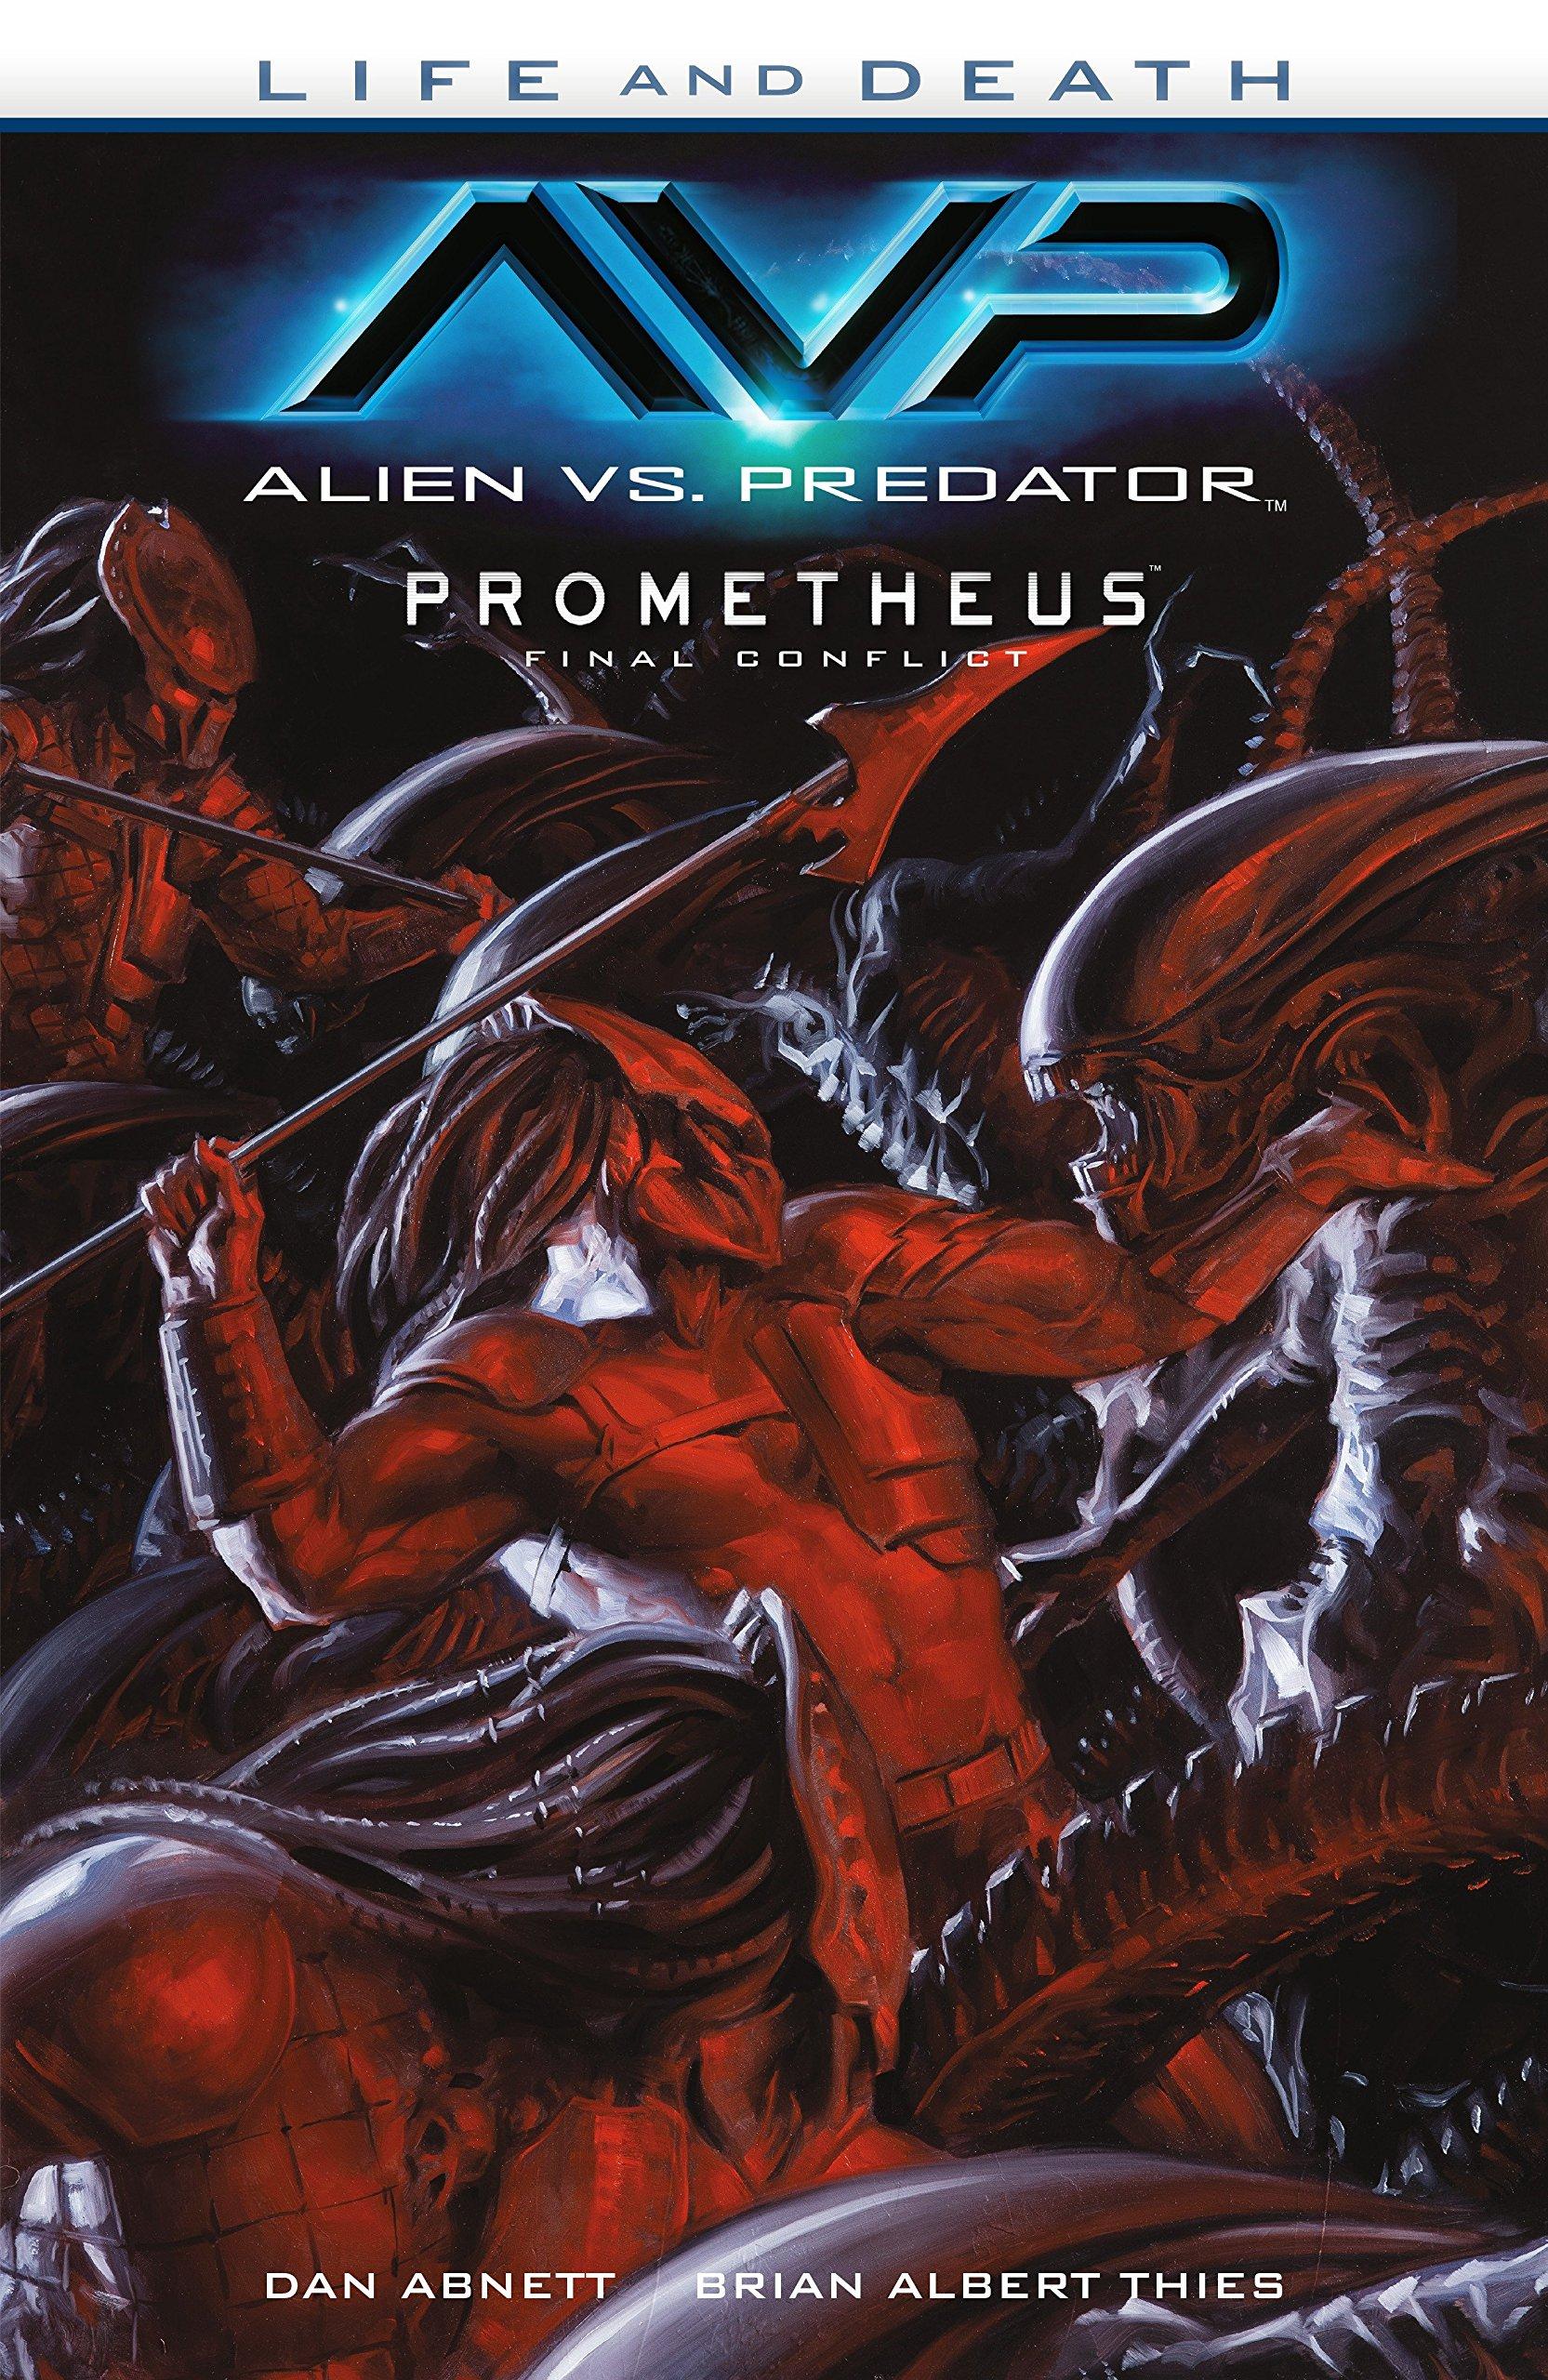 Alien vs. Predator: Life and Death by Dark Horse Books